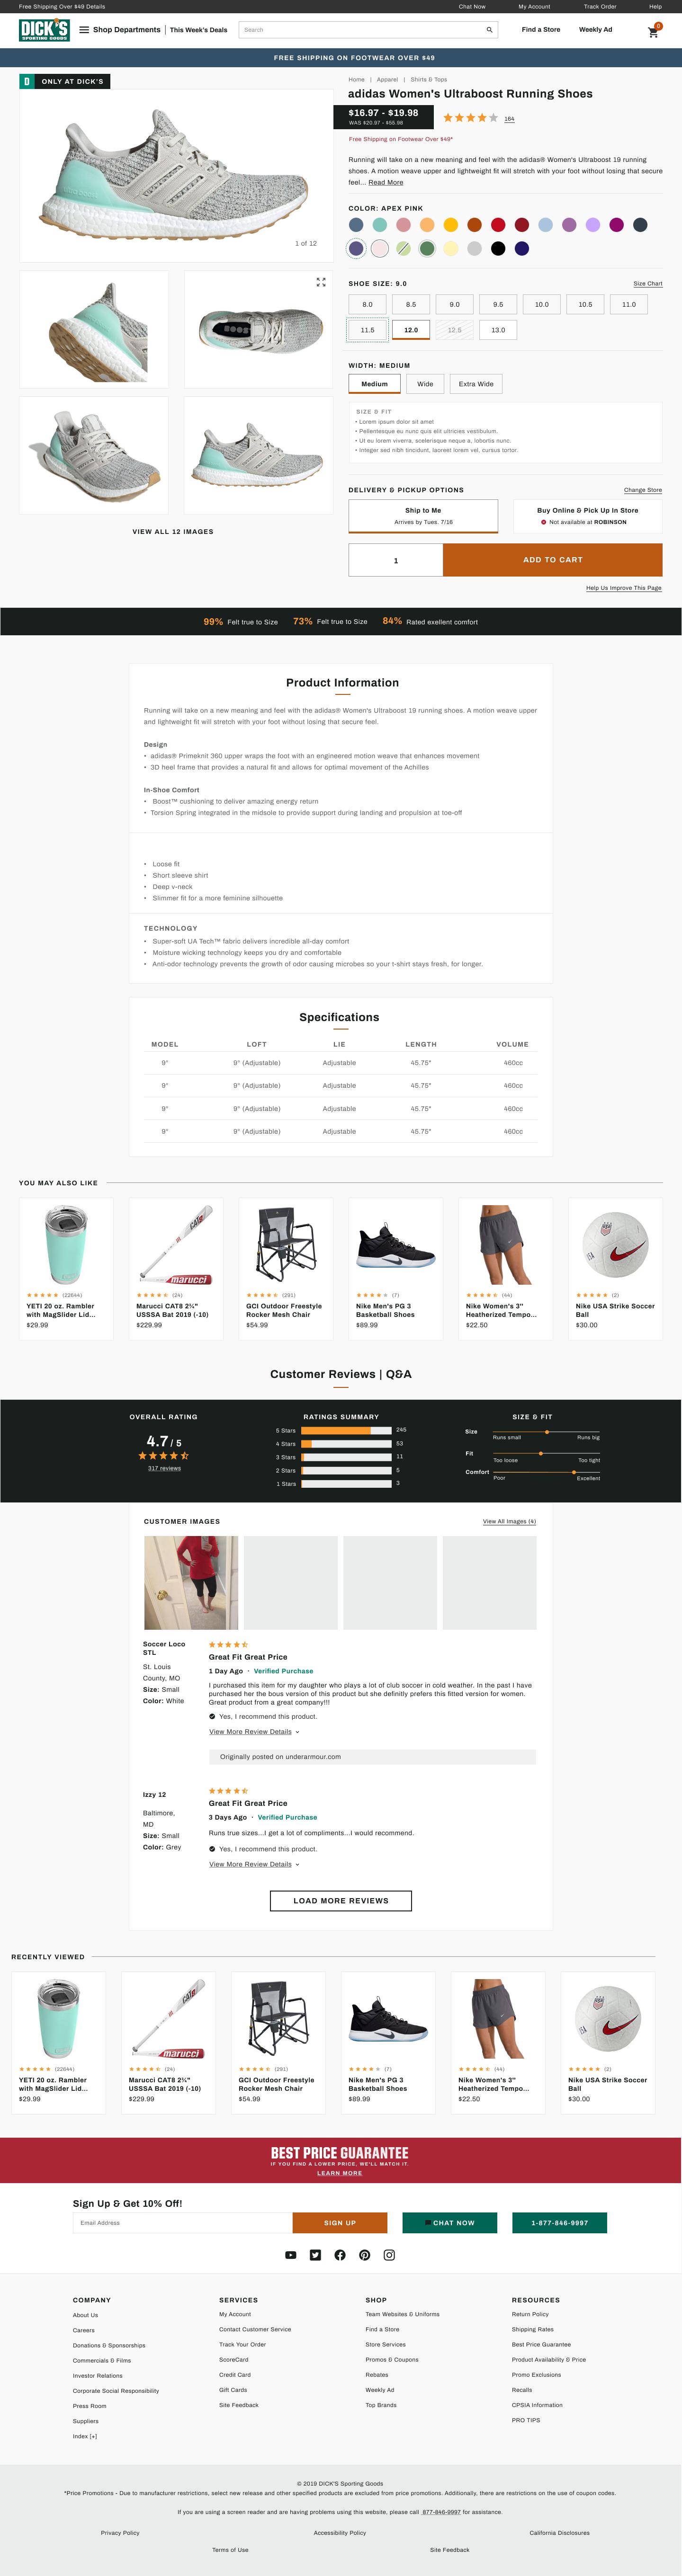 Product Details Page Final Desktop Design